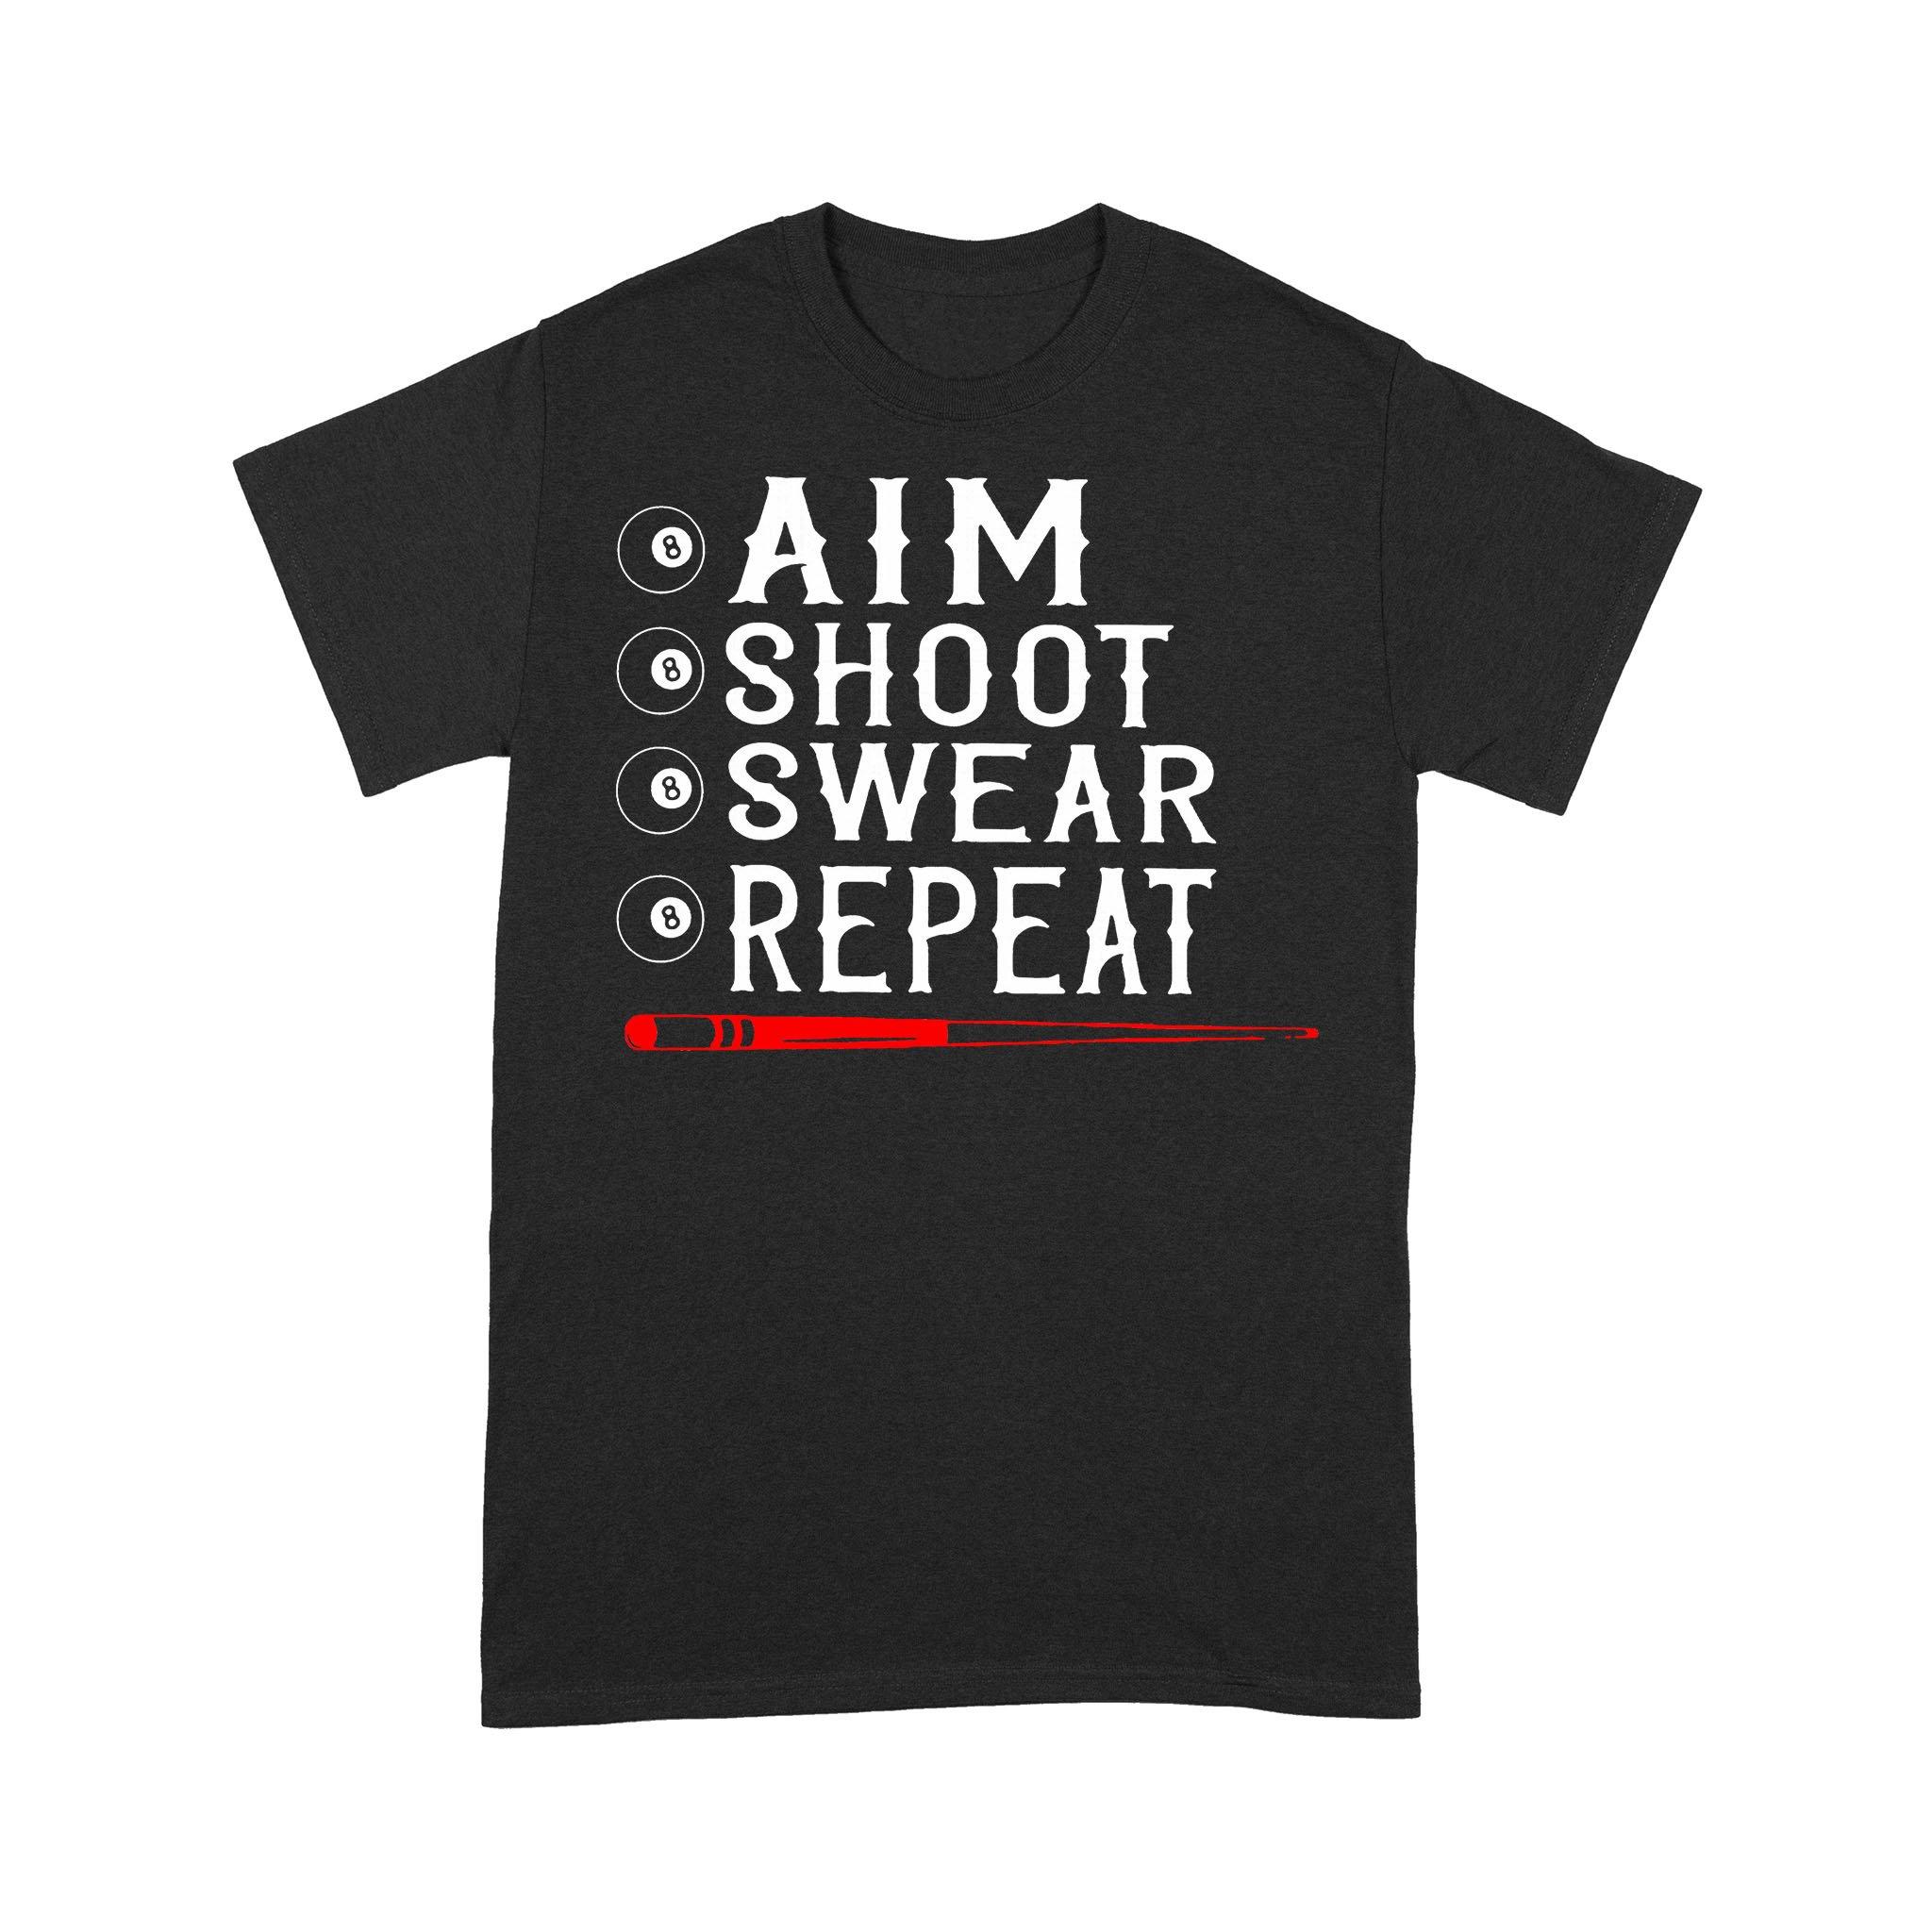 Aim Shoot Swear Repeat Billiards Christmas Gift T-shirt